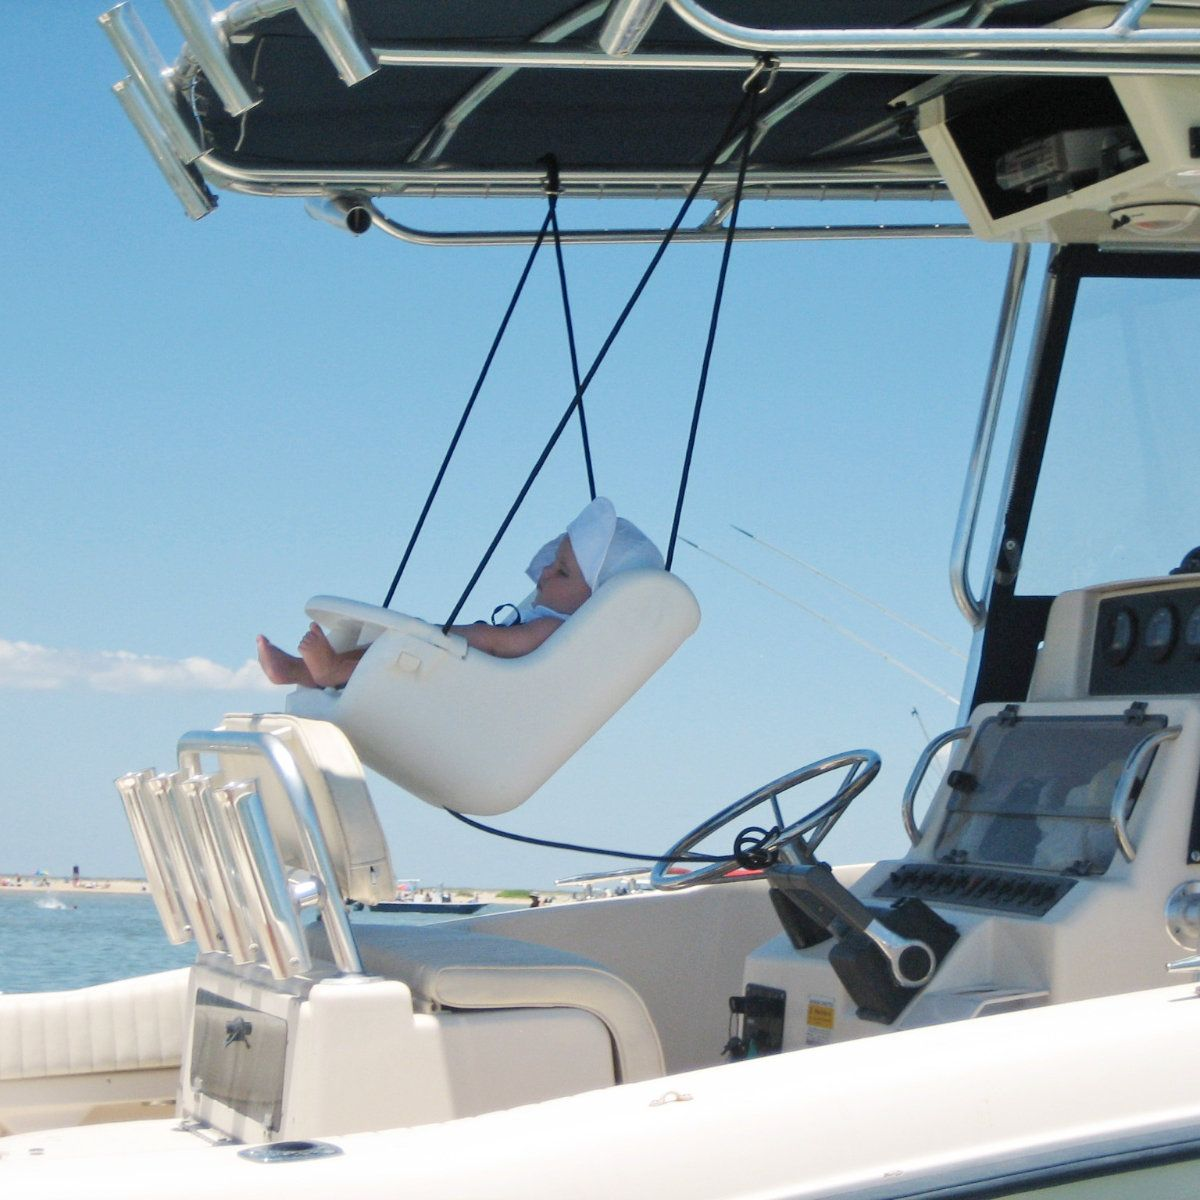 Gander mountain searock baby boat seat boating boat for Fishing boat seat